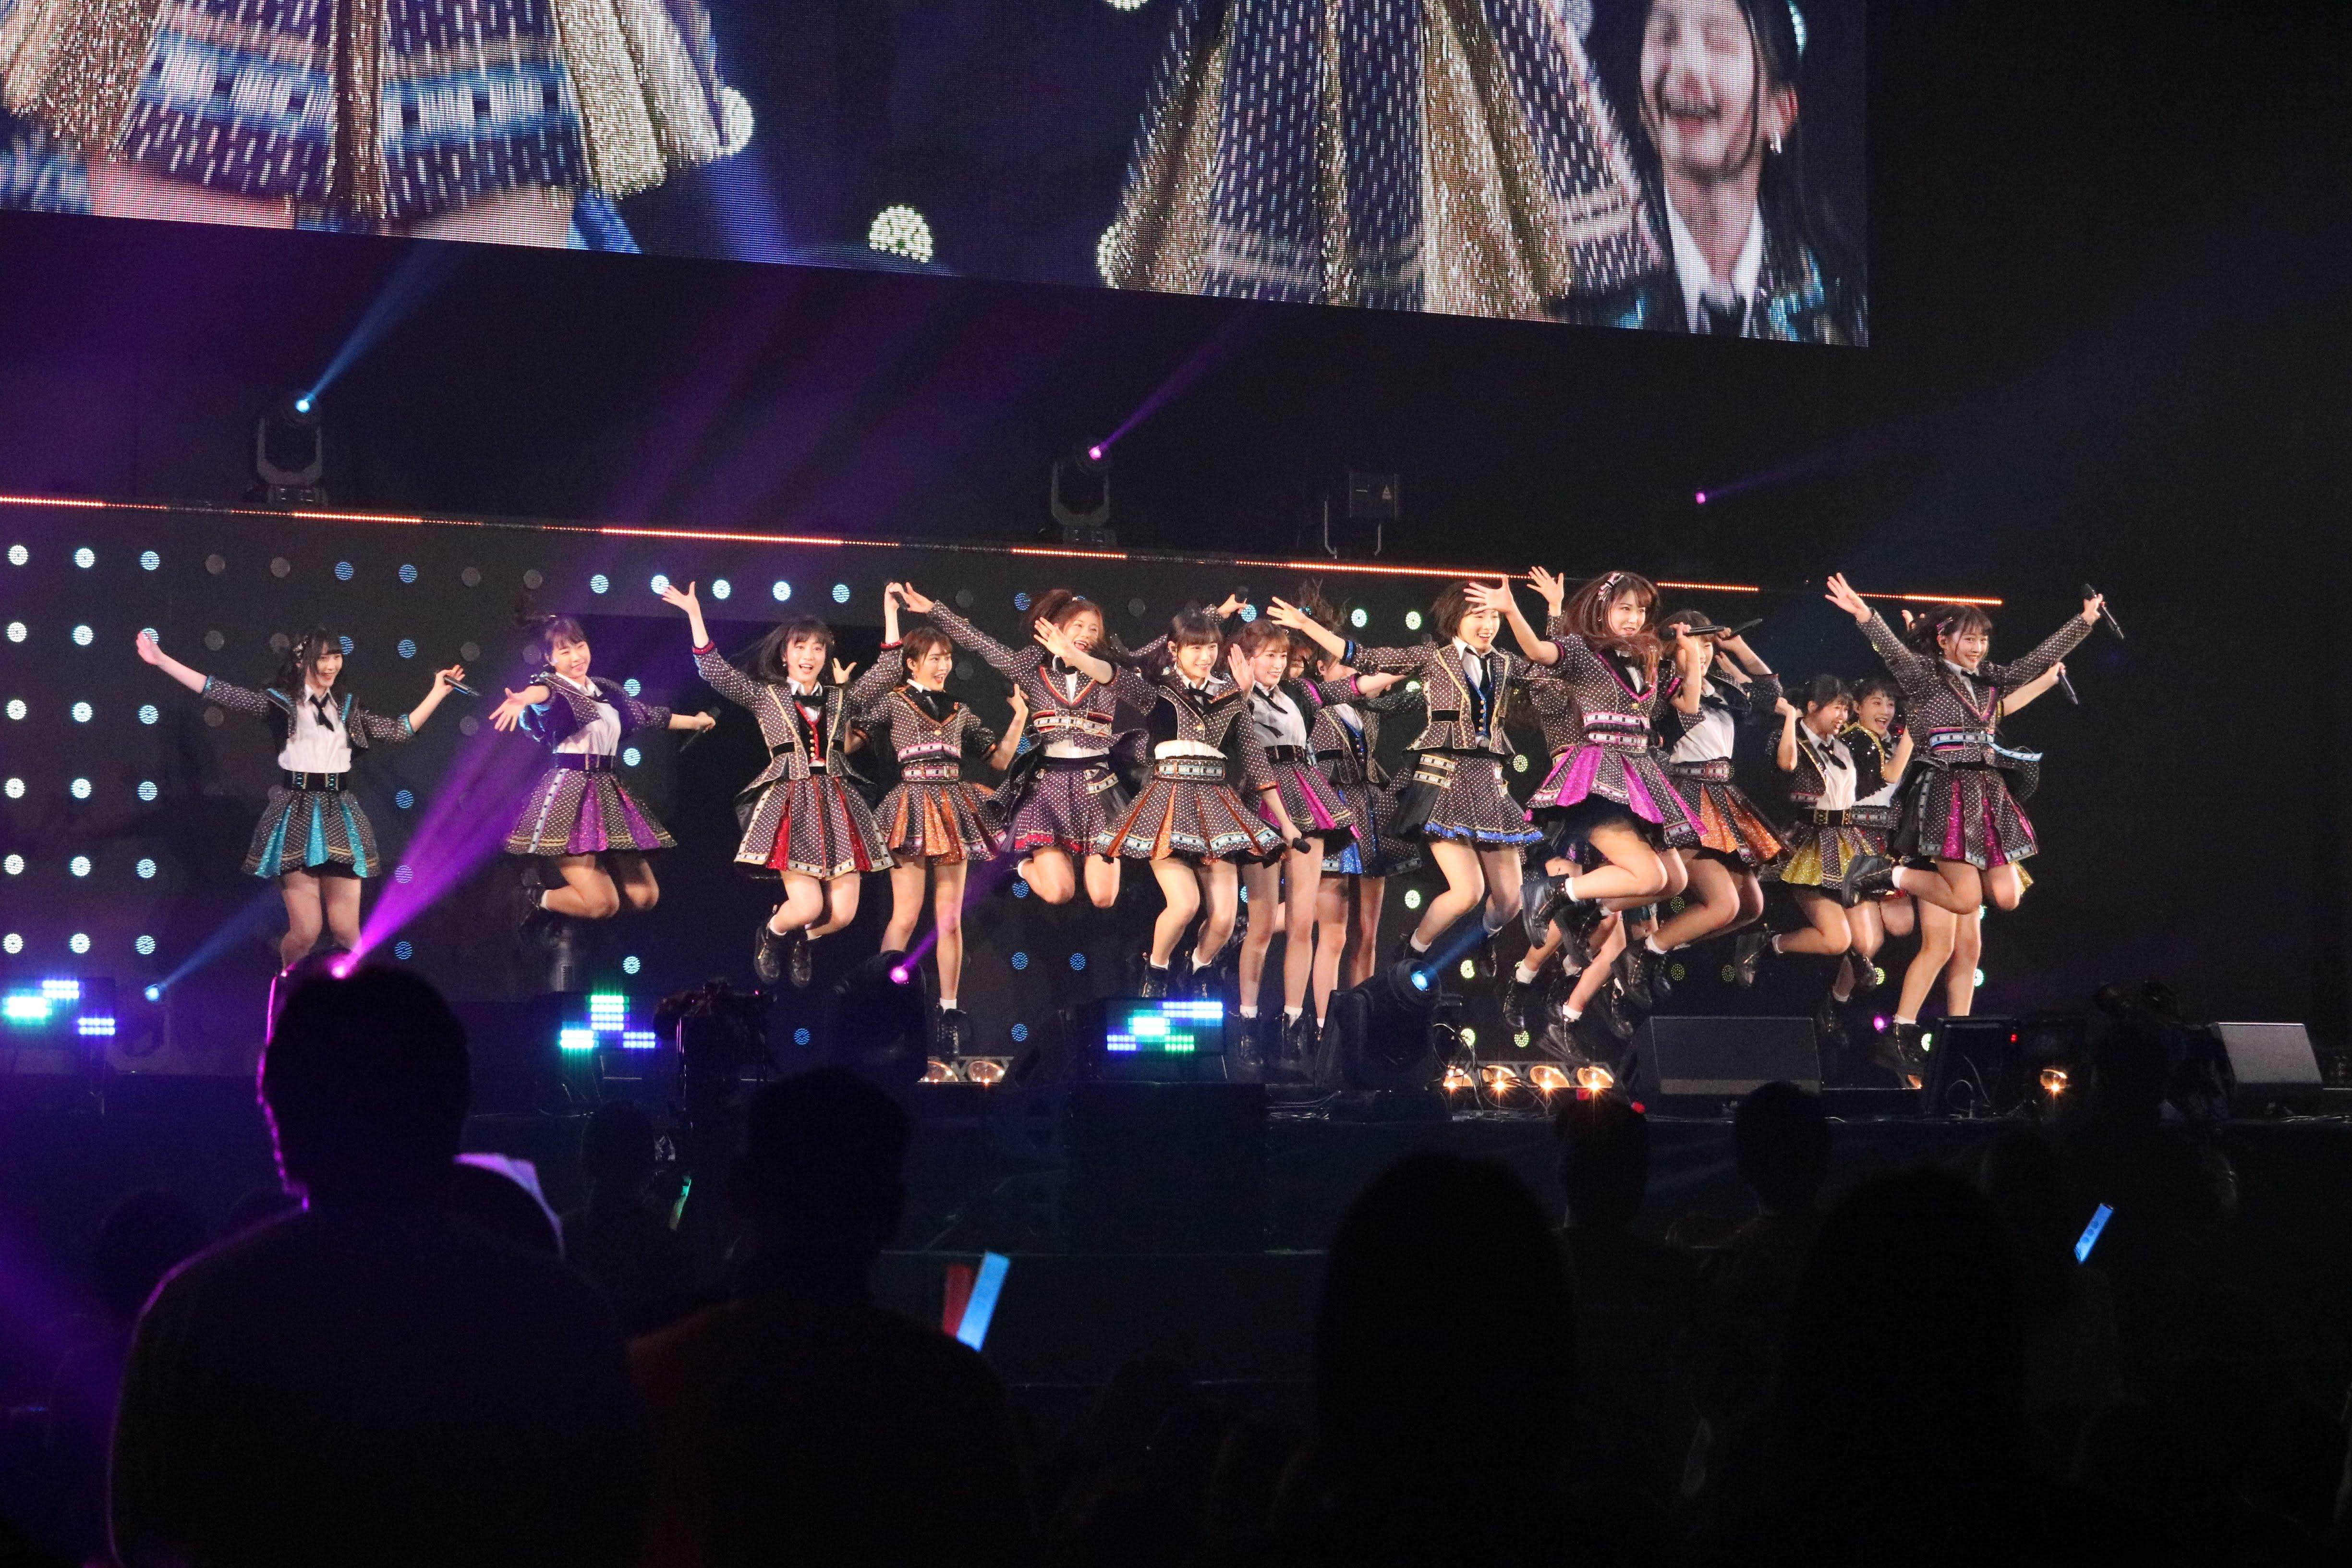 【NMB48】3月31日横浜アリーナ「TOKYO GIRLS MUJSIC FES.」メンバーSNS投稿とライブ画像。